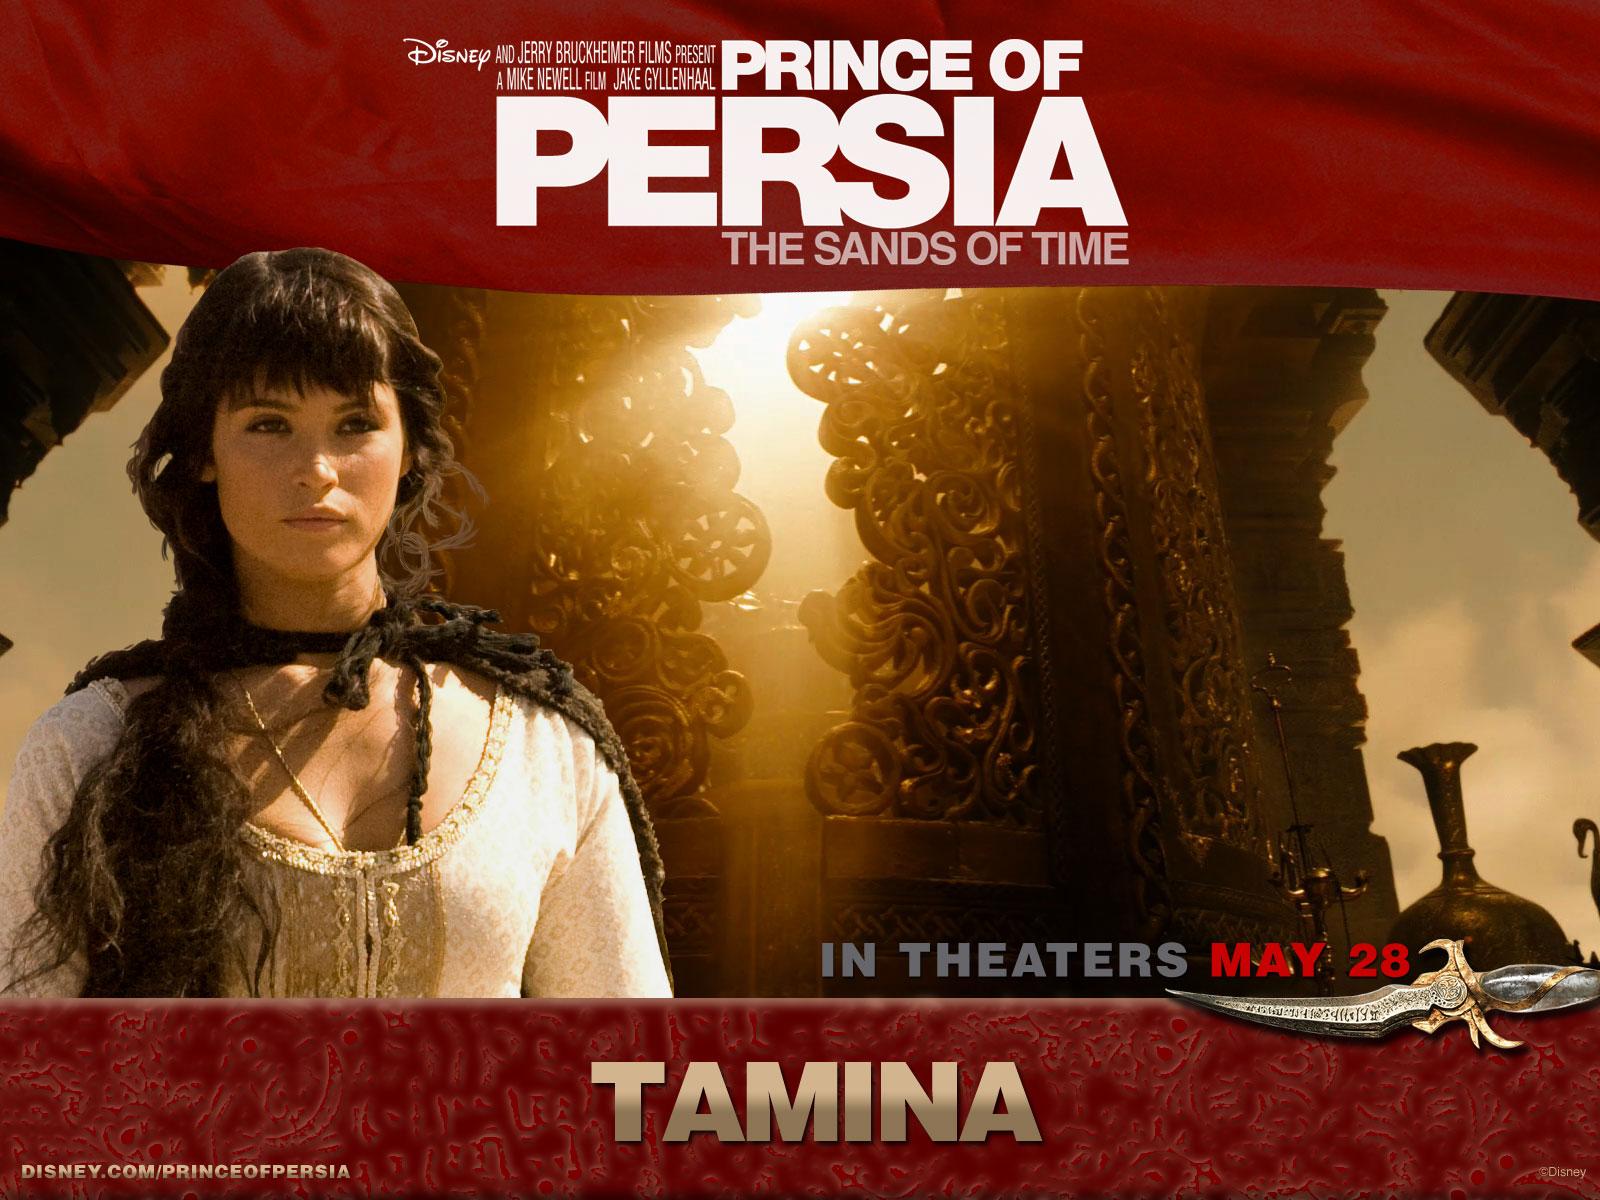 Gemma Arterton In Prince Of Persia The Sands Of Time Picture Gemma Arterton In Prince Of Persia The Sands Of Time Image Gemma Arterton In Prince Of Persia The Sands Of Time